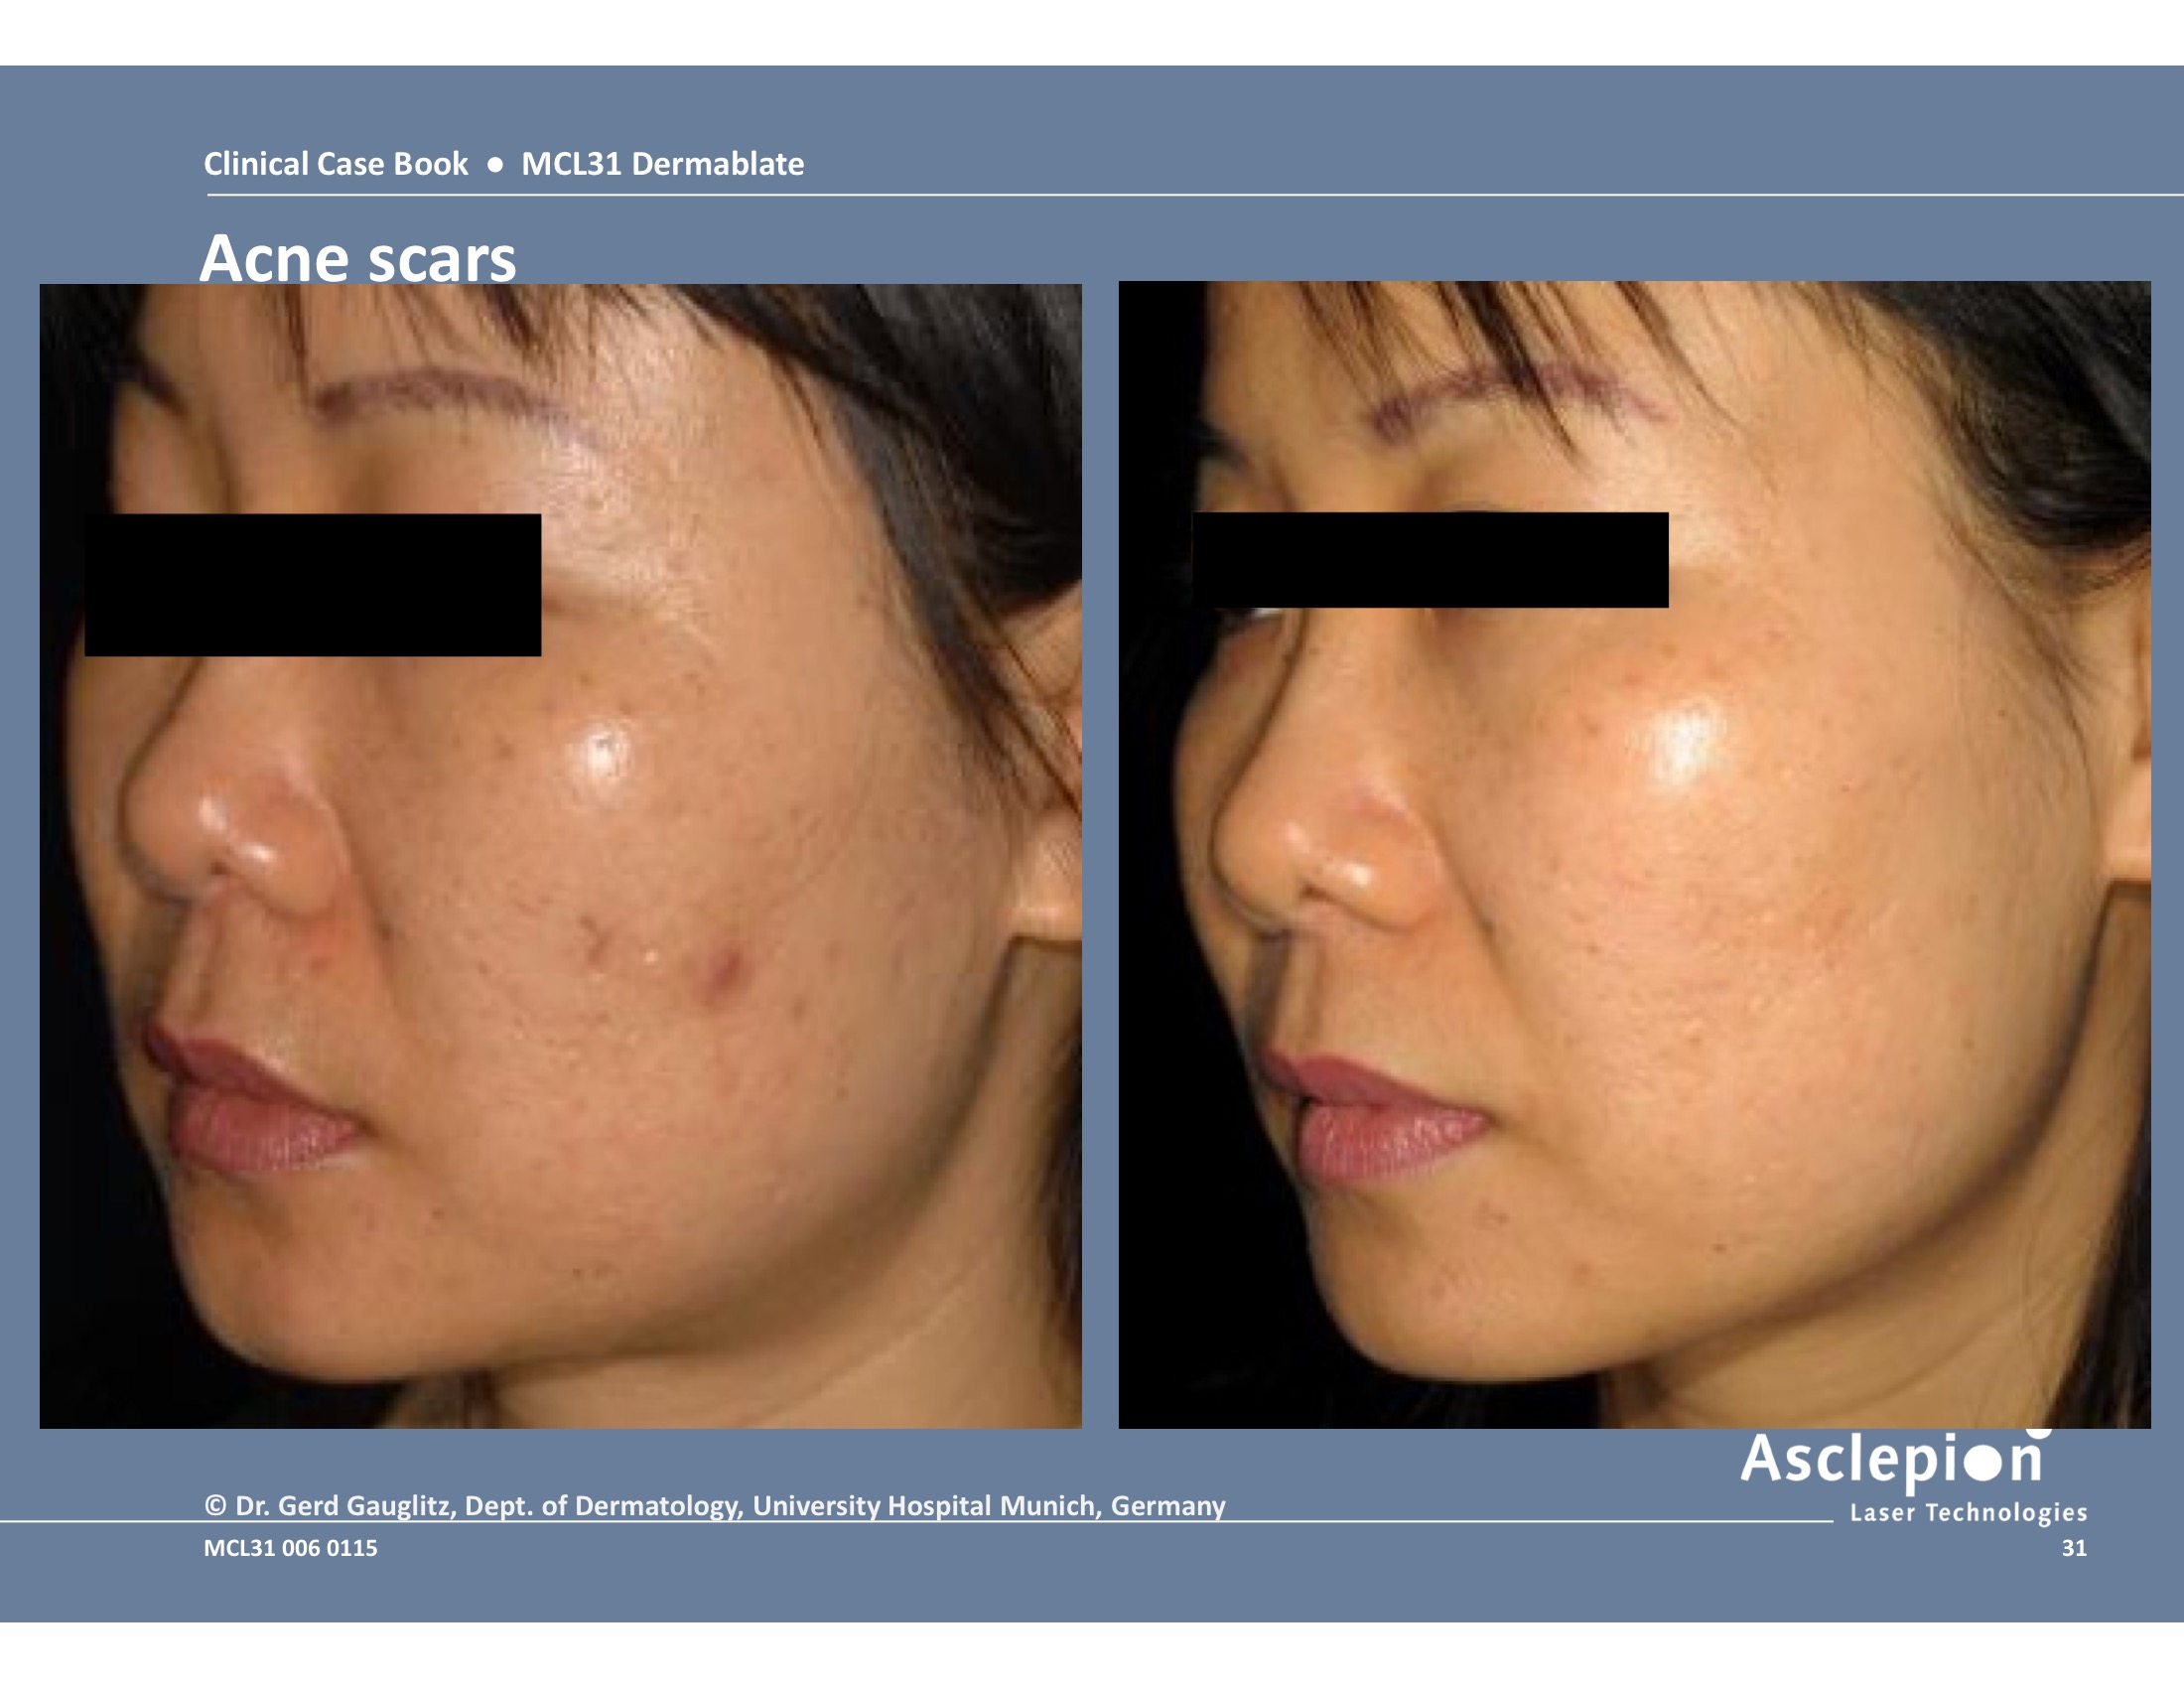 MCL 31 DERMABLATE Erbium Laser Skin Resurfacing - Contemporary